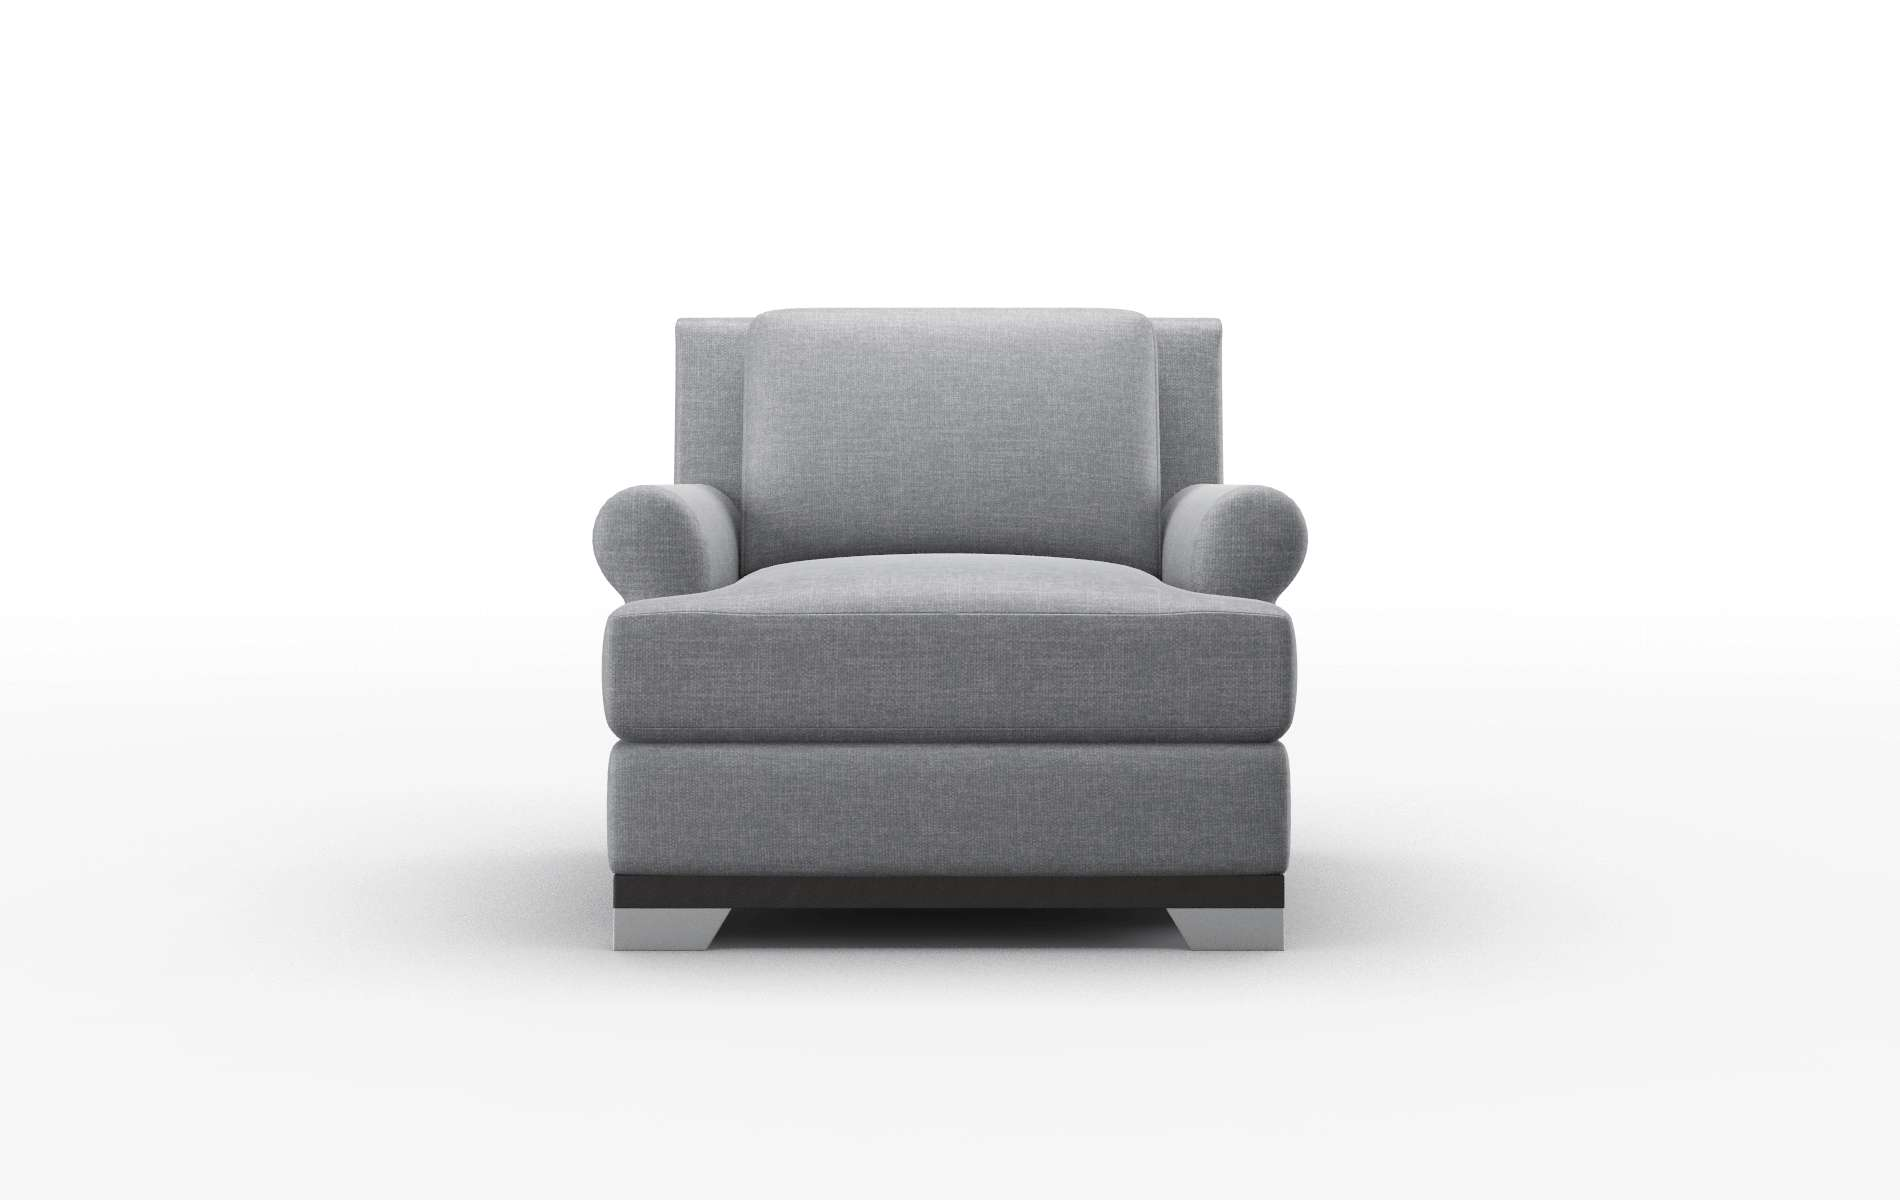 Newyork Keylargo Graphite Chair espresso legs 1